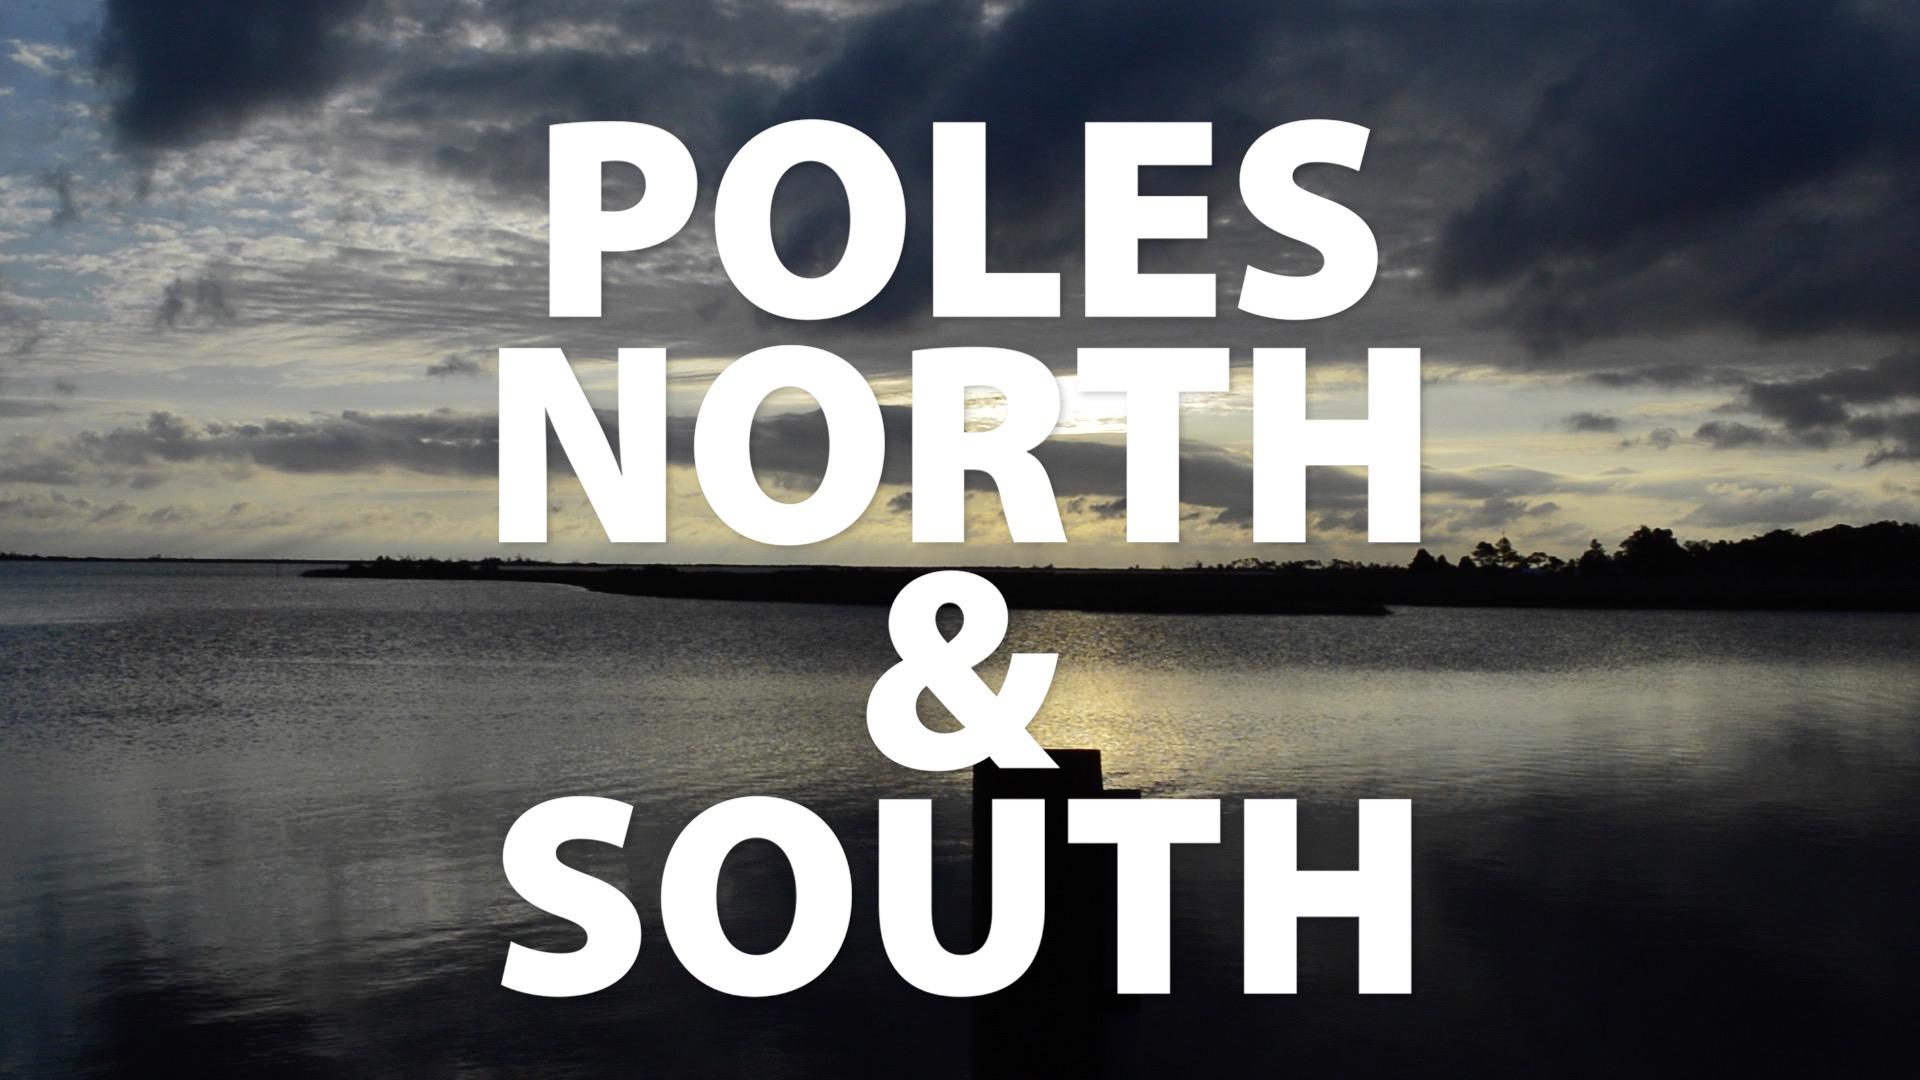 Poles North & South